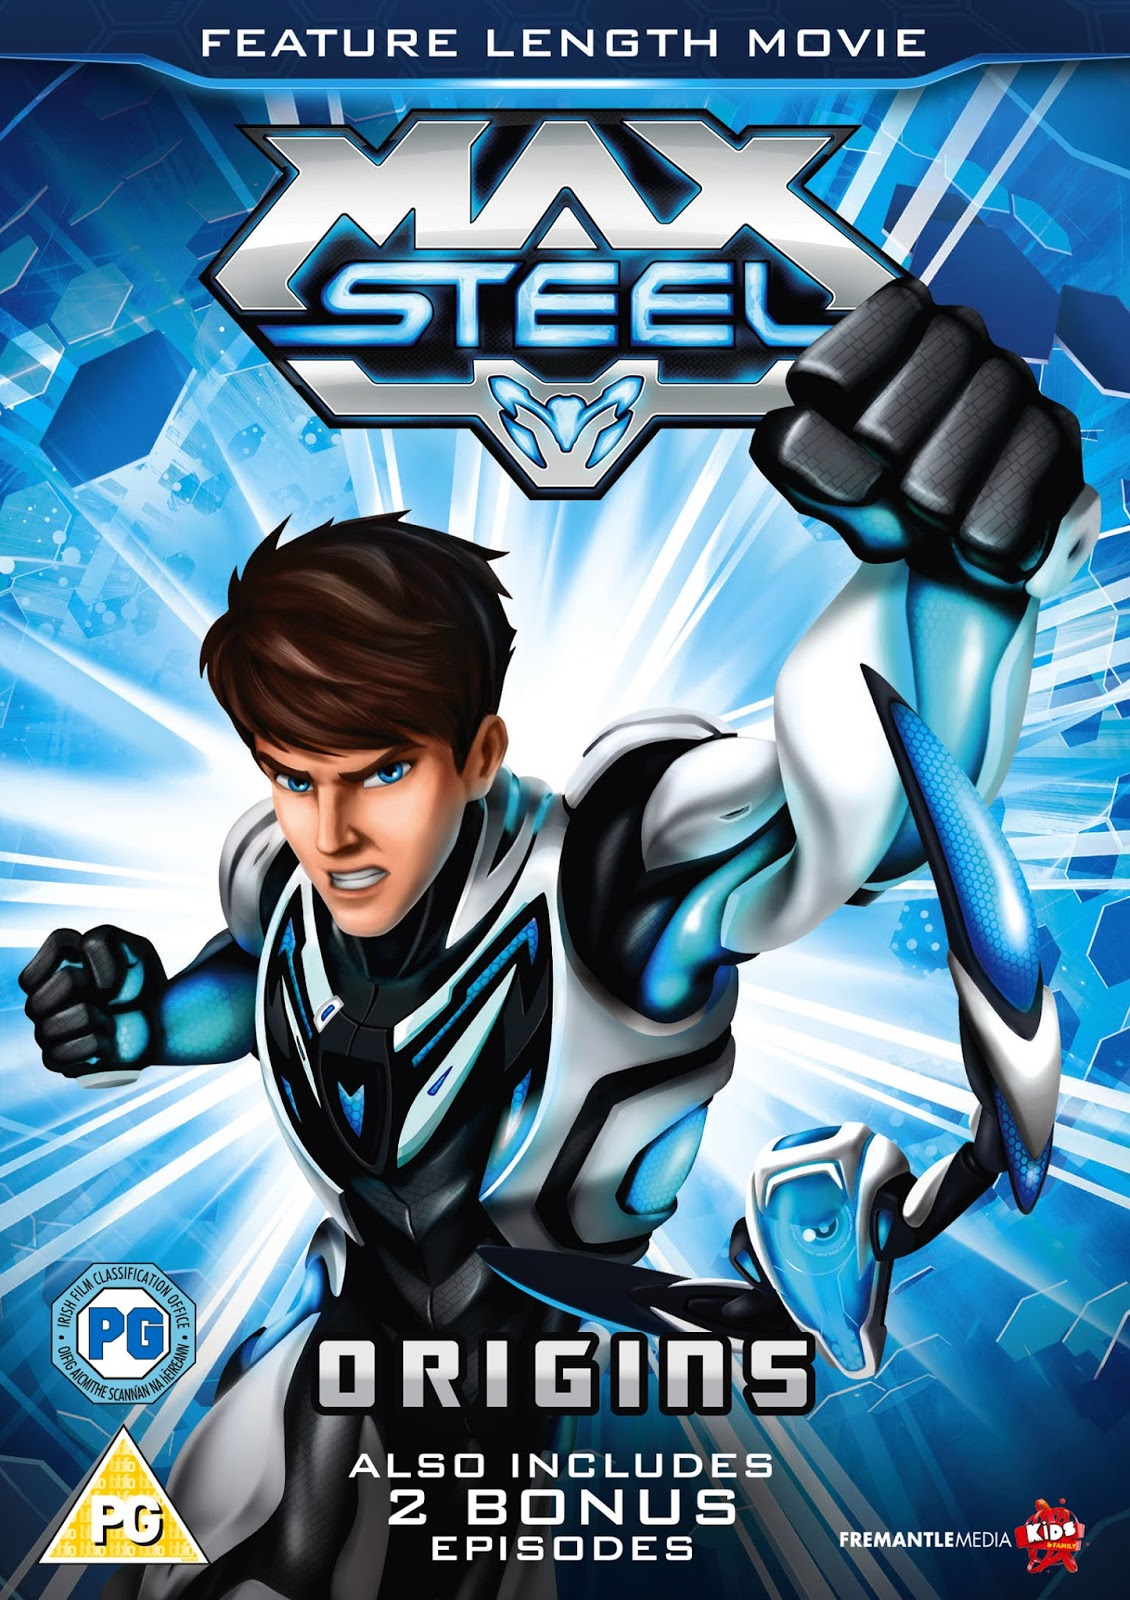 Download Max Steel Origins (2013) DVDRip x264-RedBlade